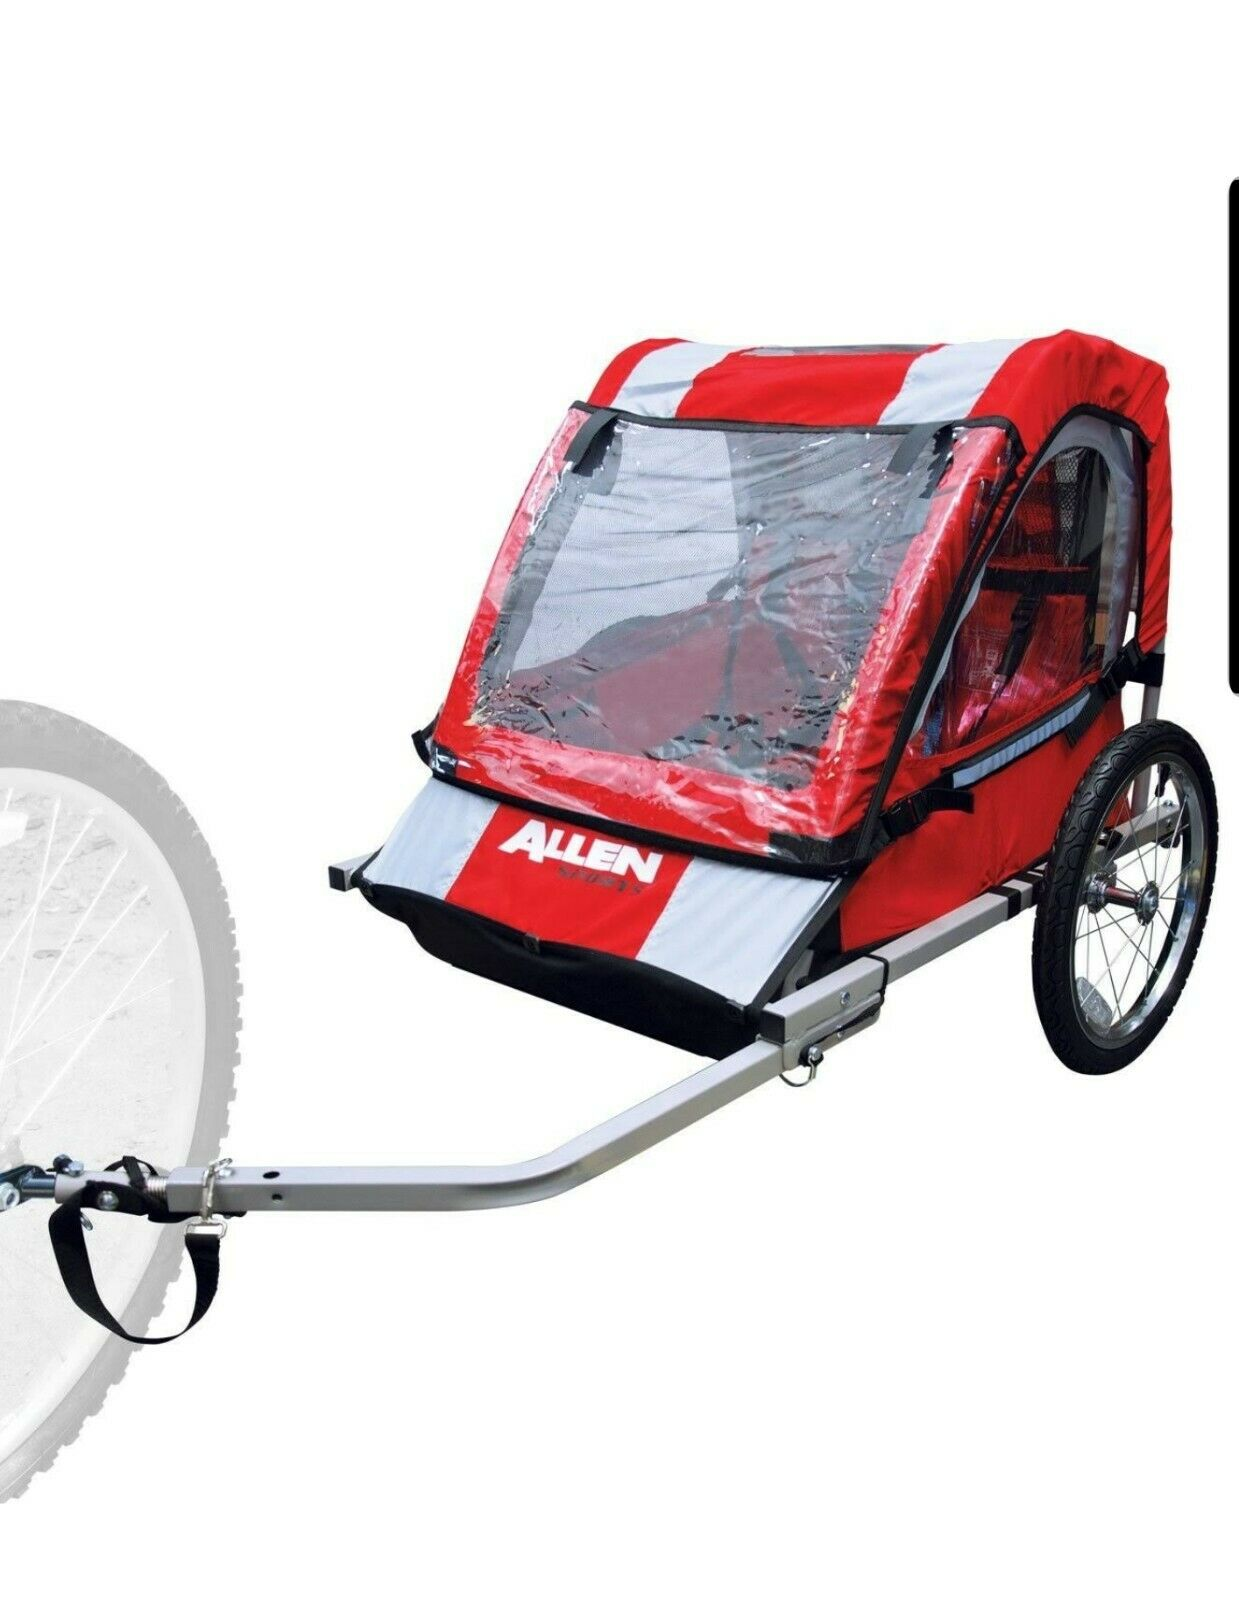 Allen Sports Steel Bicycle Trailer, Safe Lightweight Comfort